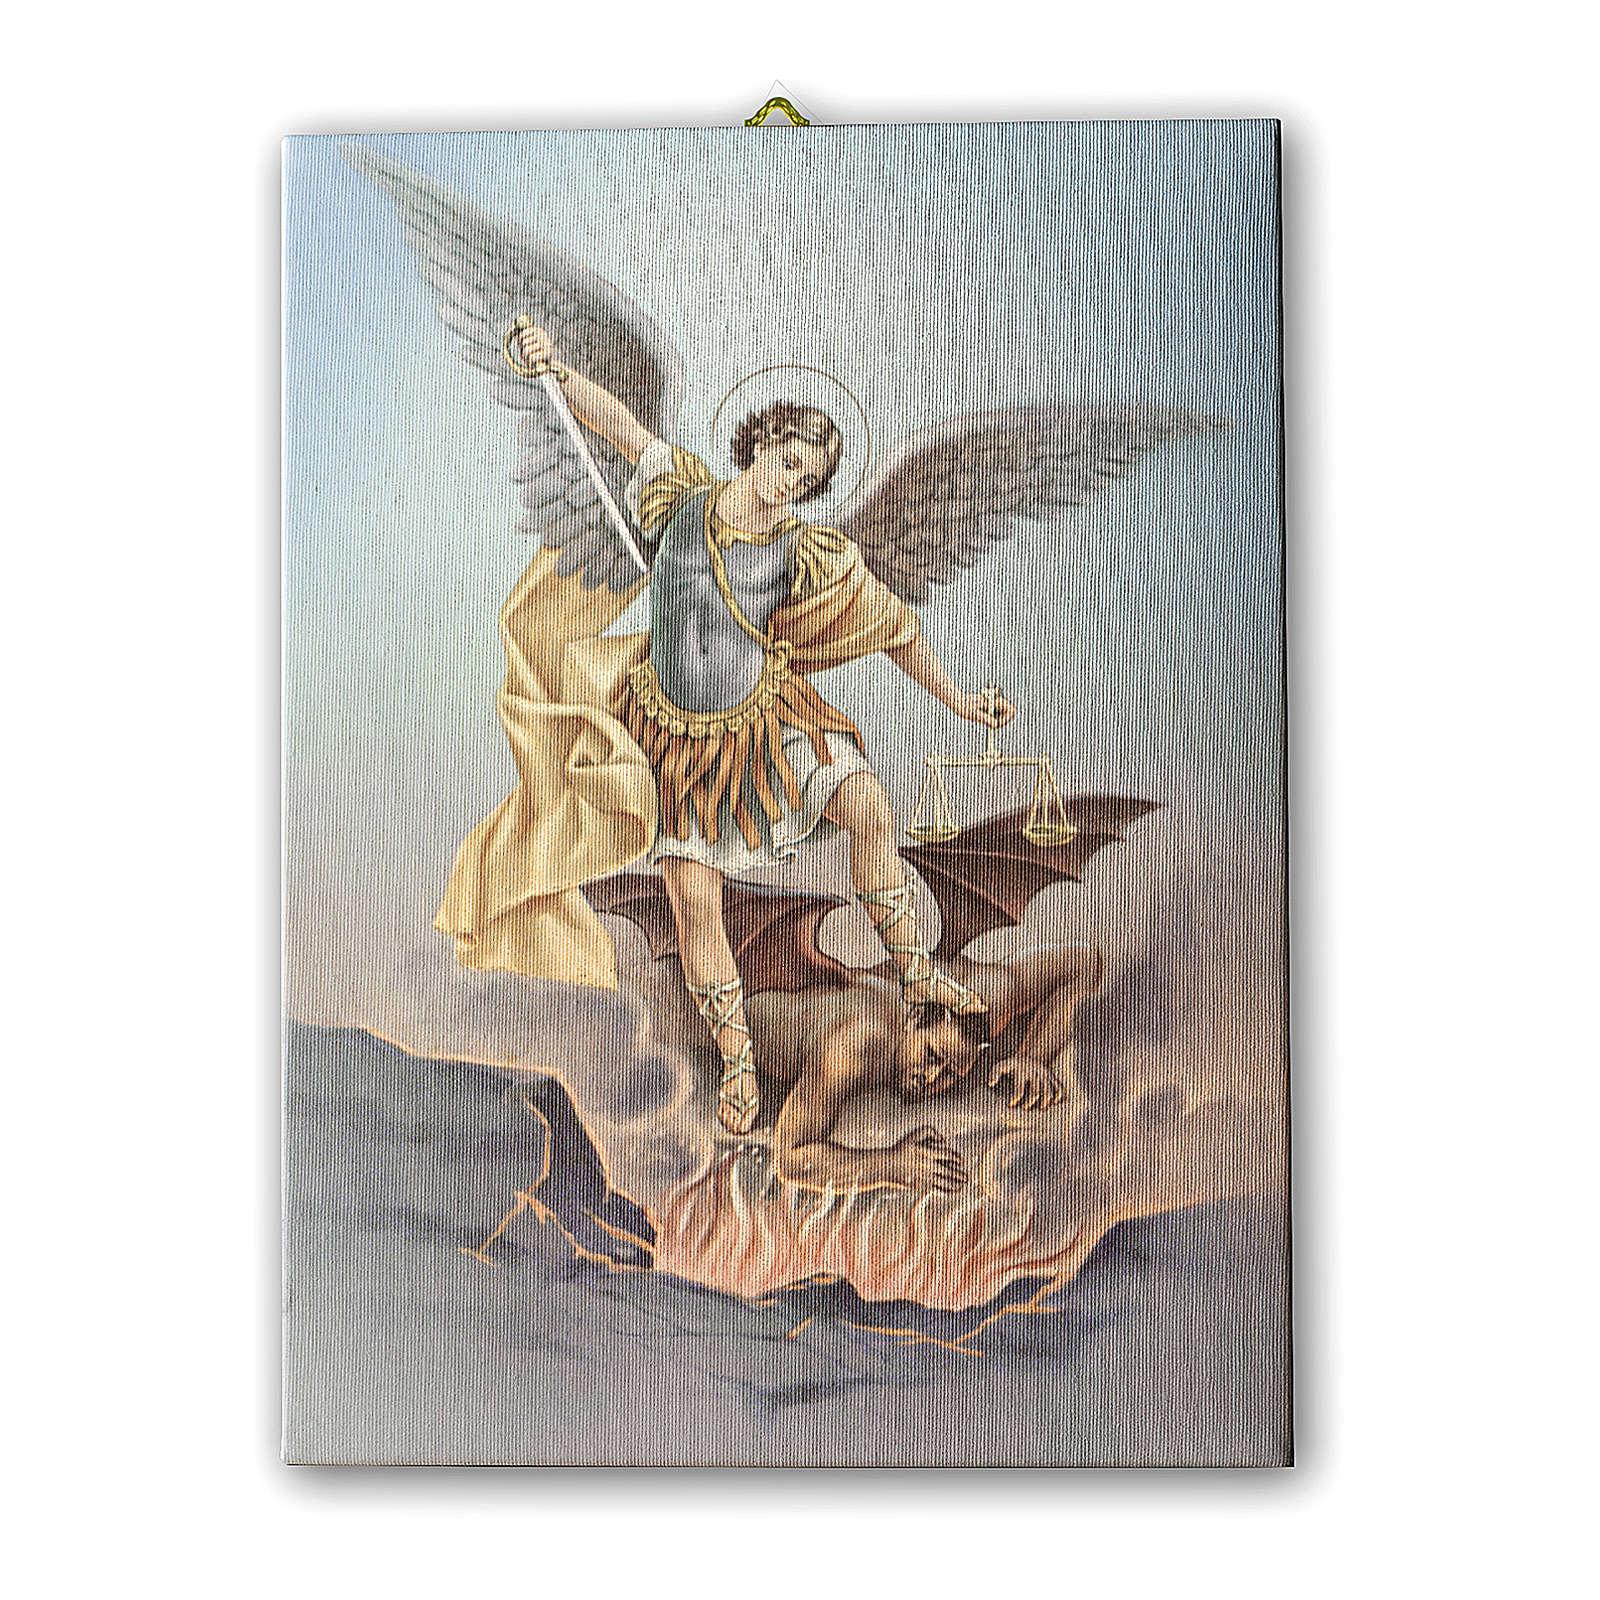 Cuadro sobre tela pictórica San Miguel Arcángel 25x20 cm 3